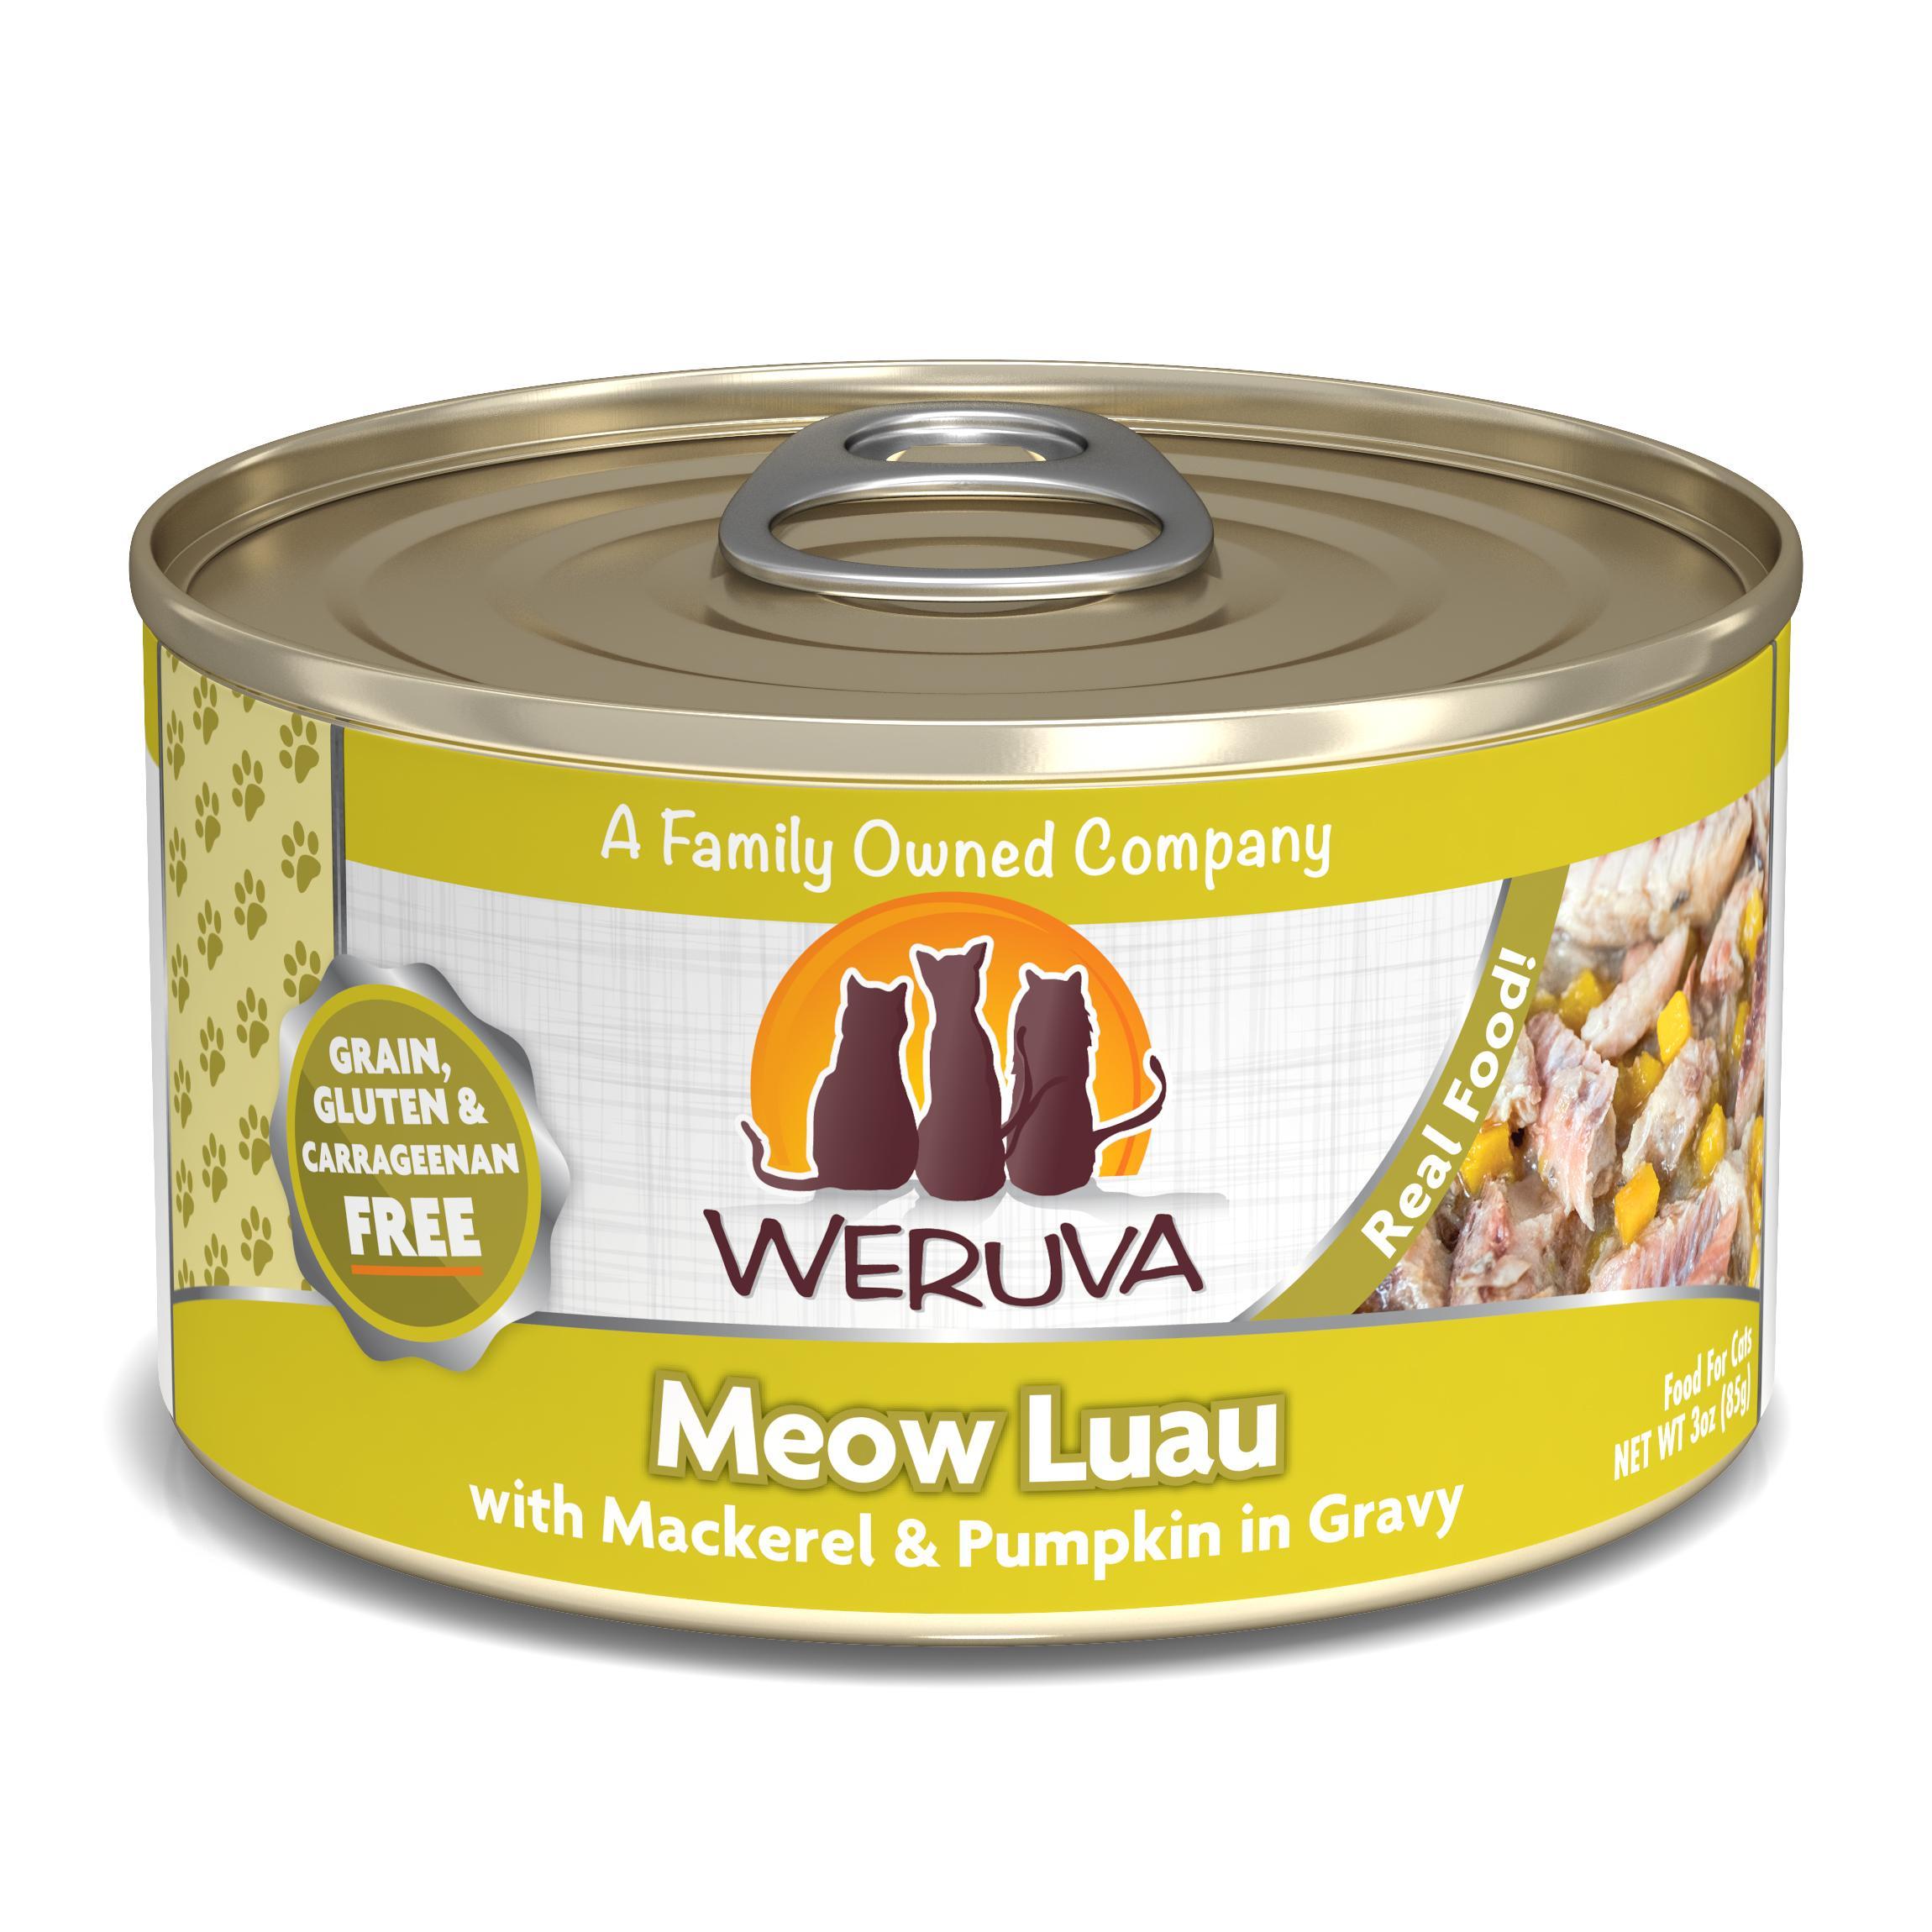 Weruva Cat Classic Meow Luau with Mackerel & Pumpkin Grain-Free Wet Cat Food, 3-oz